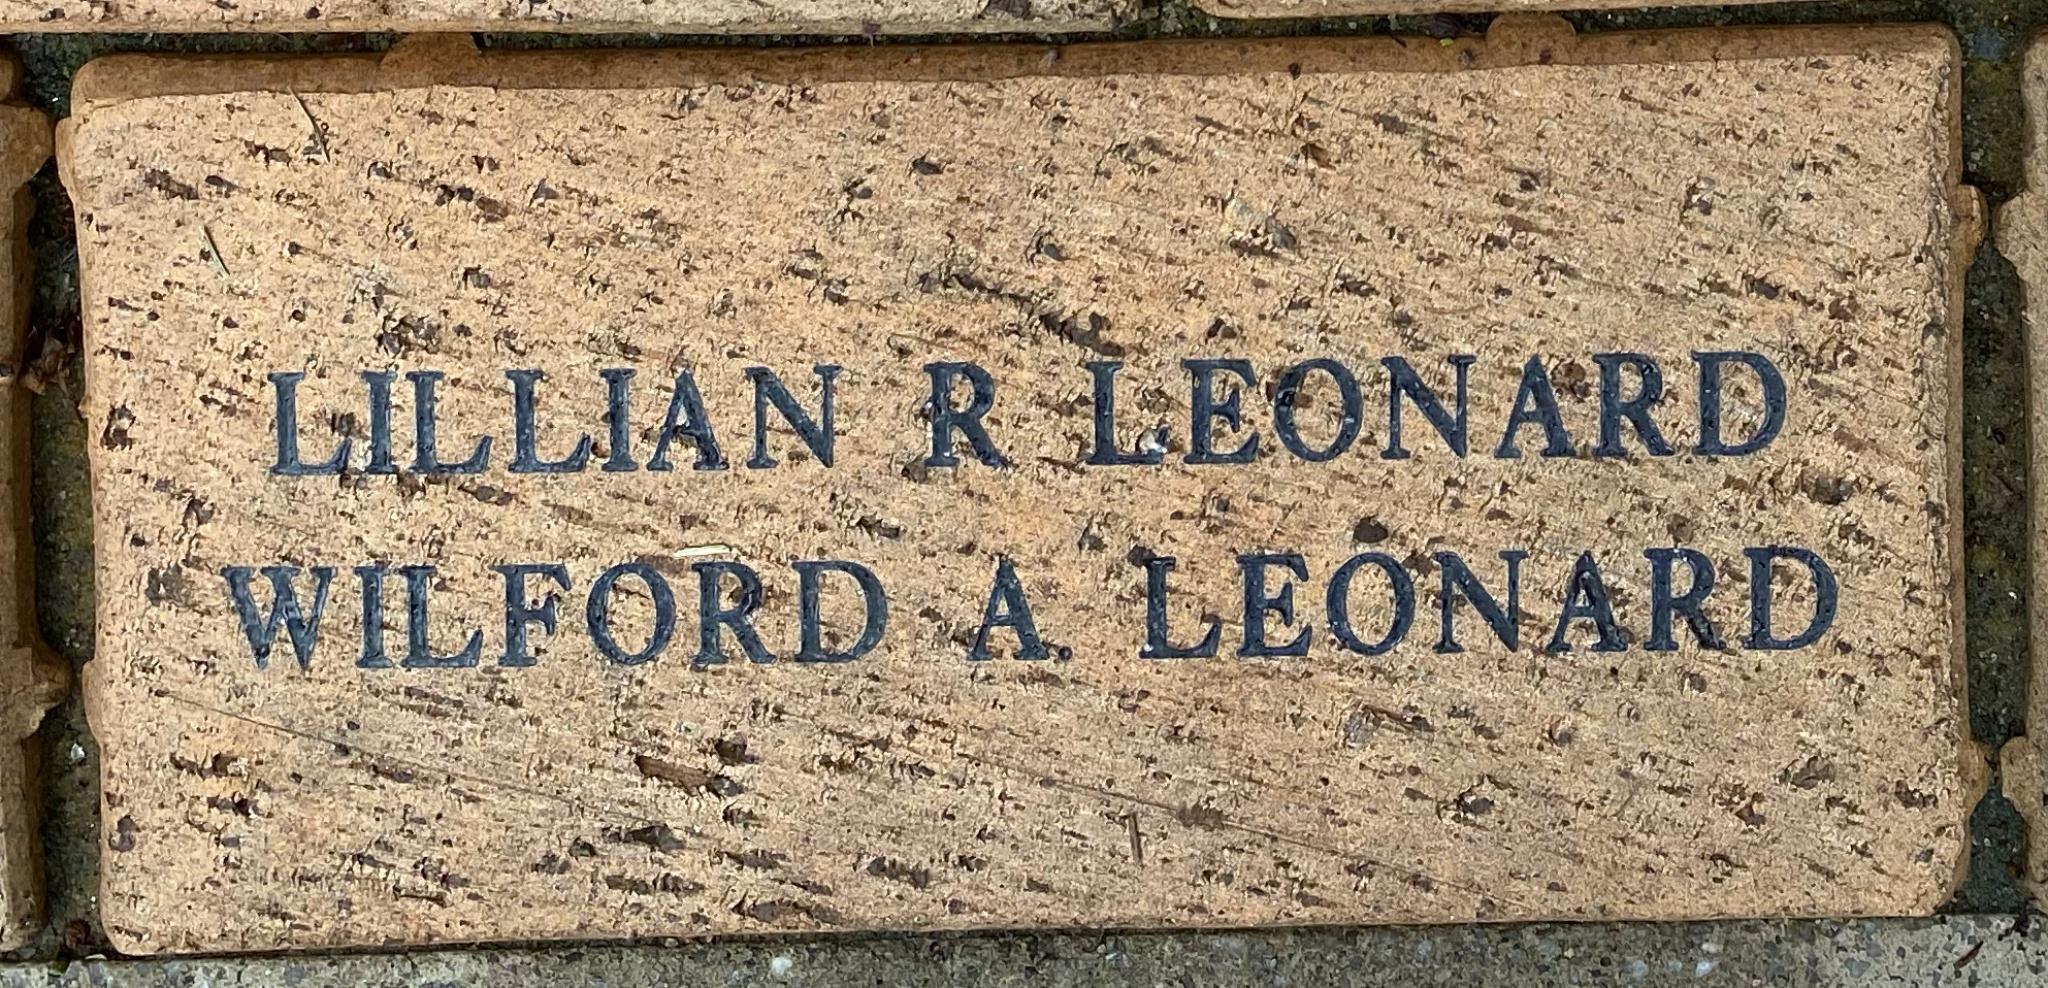 LILLIAN R LEONARD WILFORD A LEONARD